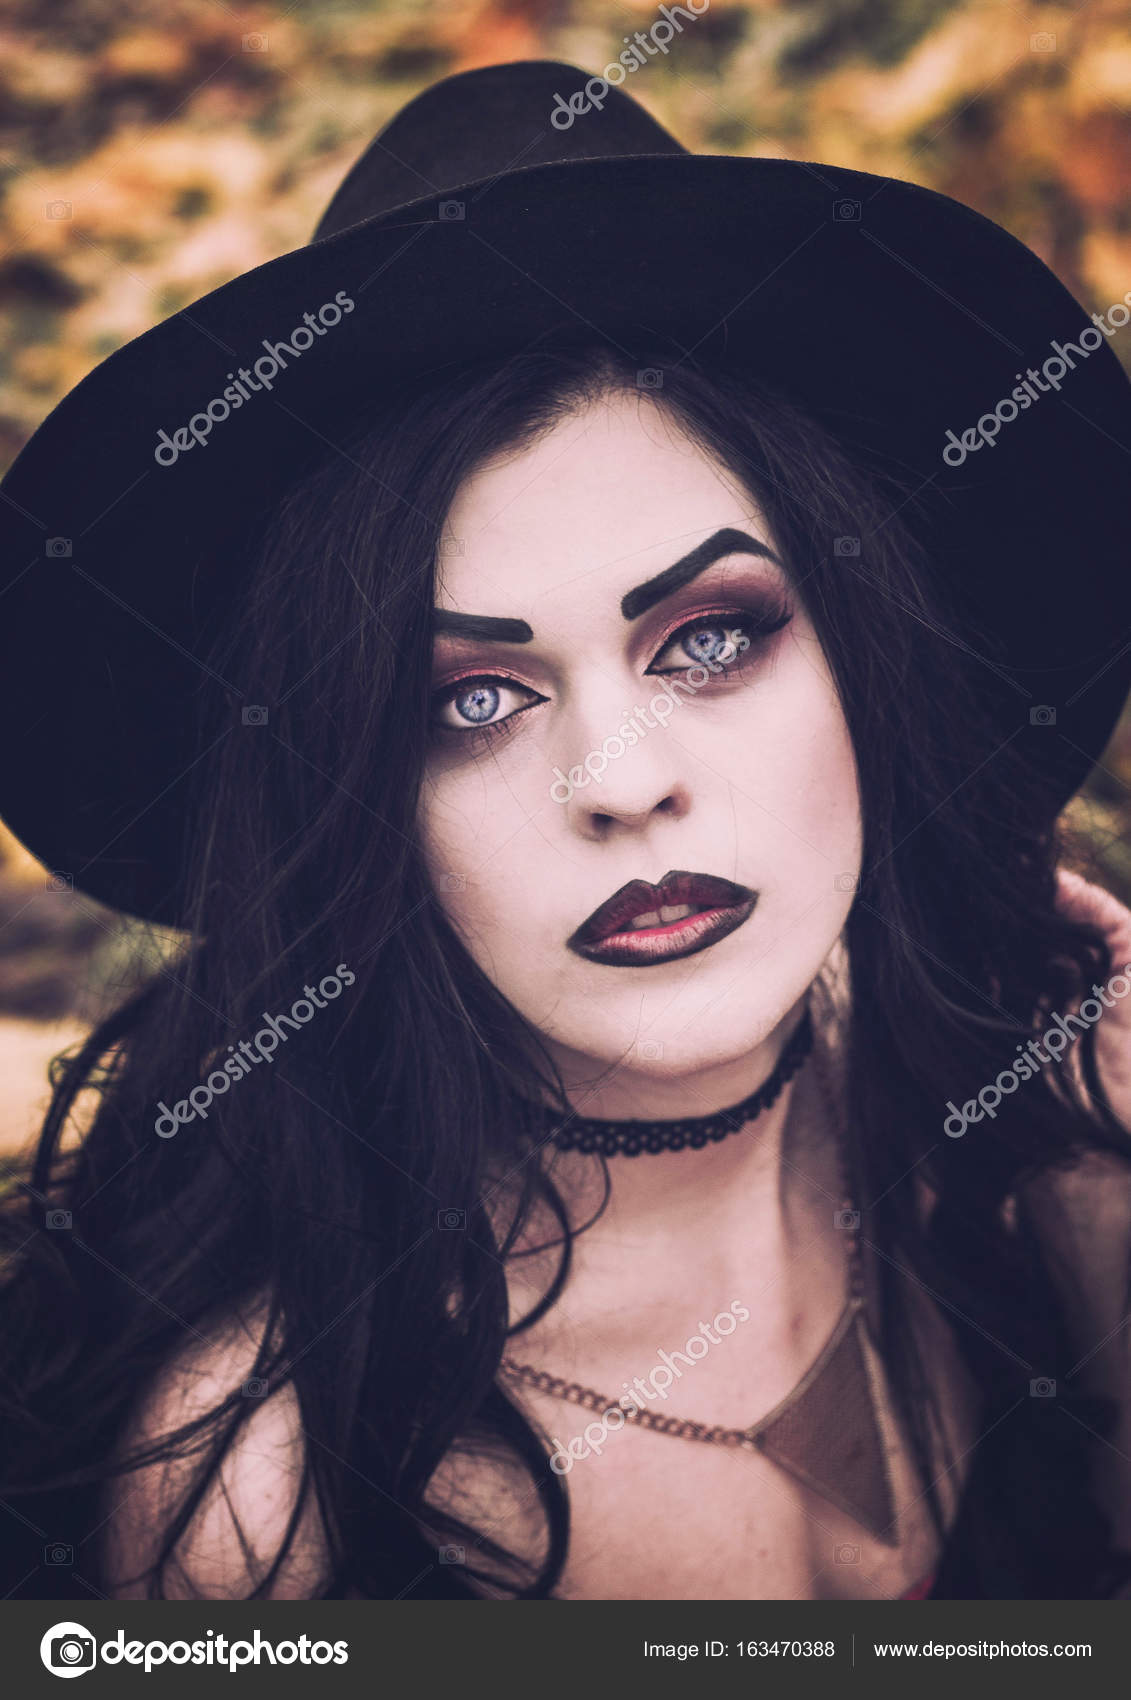 Fotos Maquillaje De Bruja Sexi La Imagen De Una Bruja Para - Maquillaje-profesional-halloween